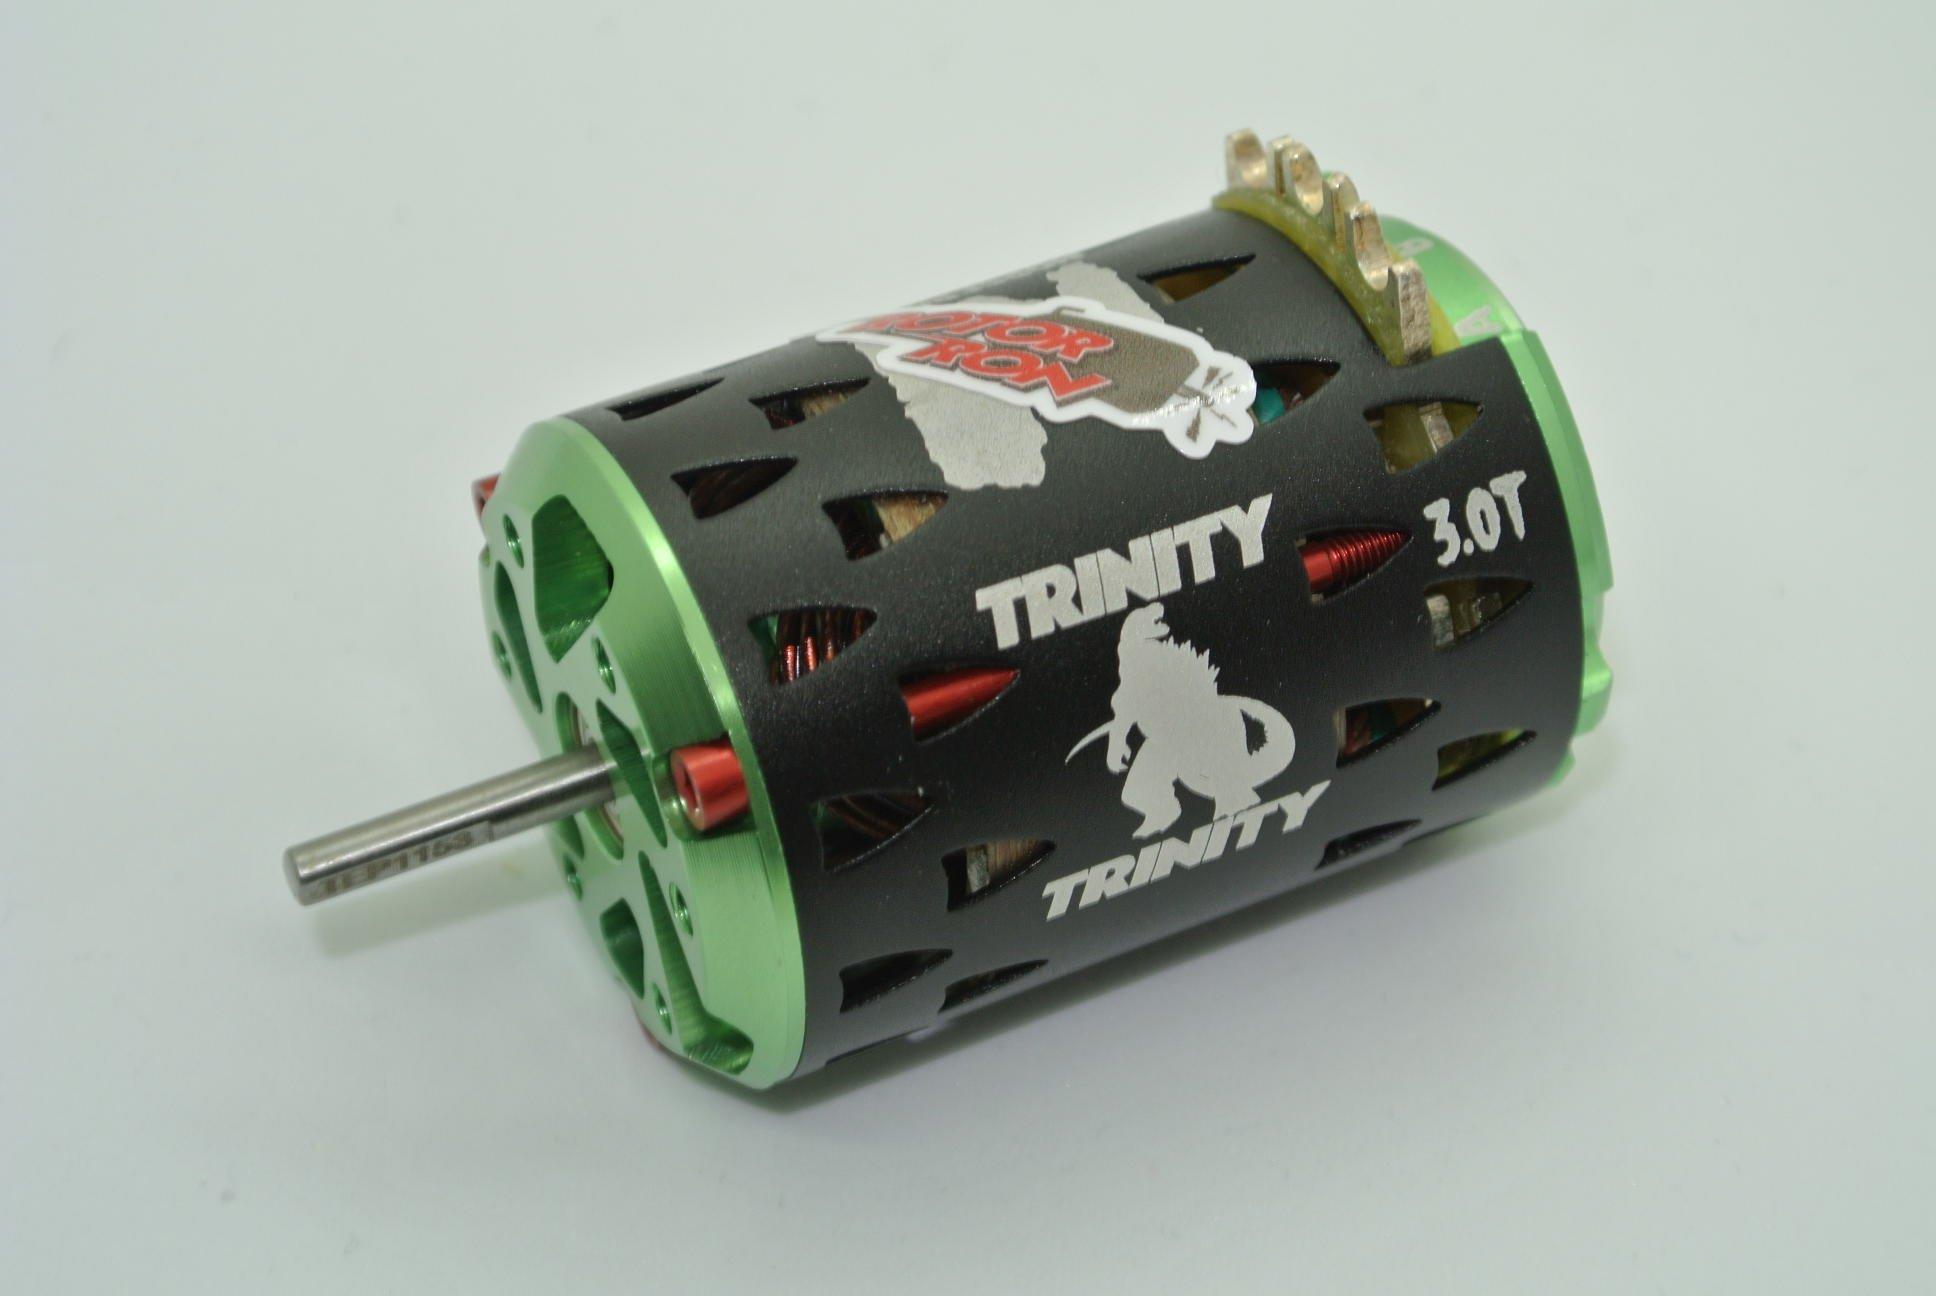 Trinity monster max 3 0 turn upgraded tuned mod drag racing brushless motor